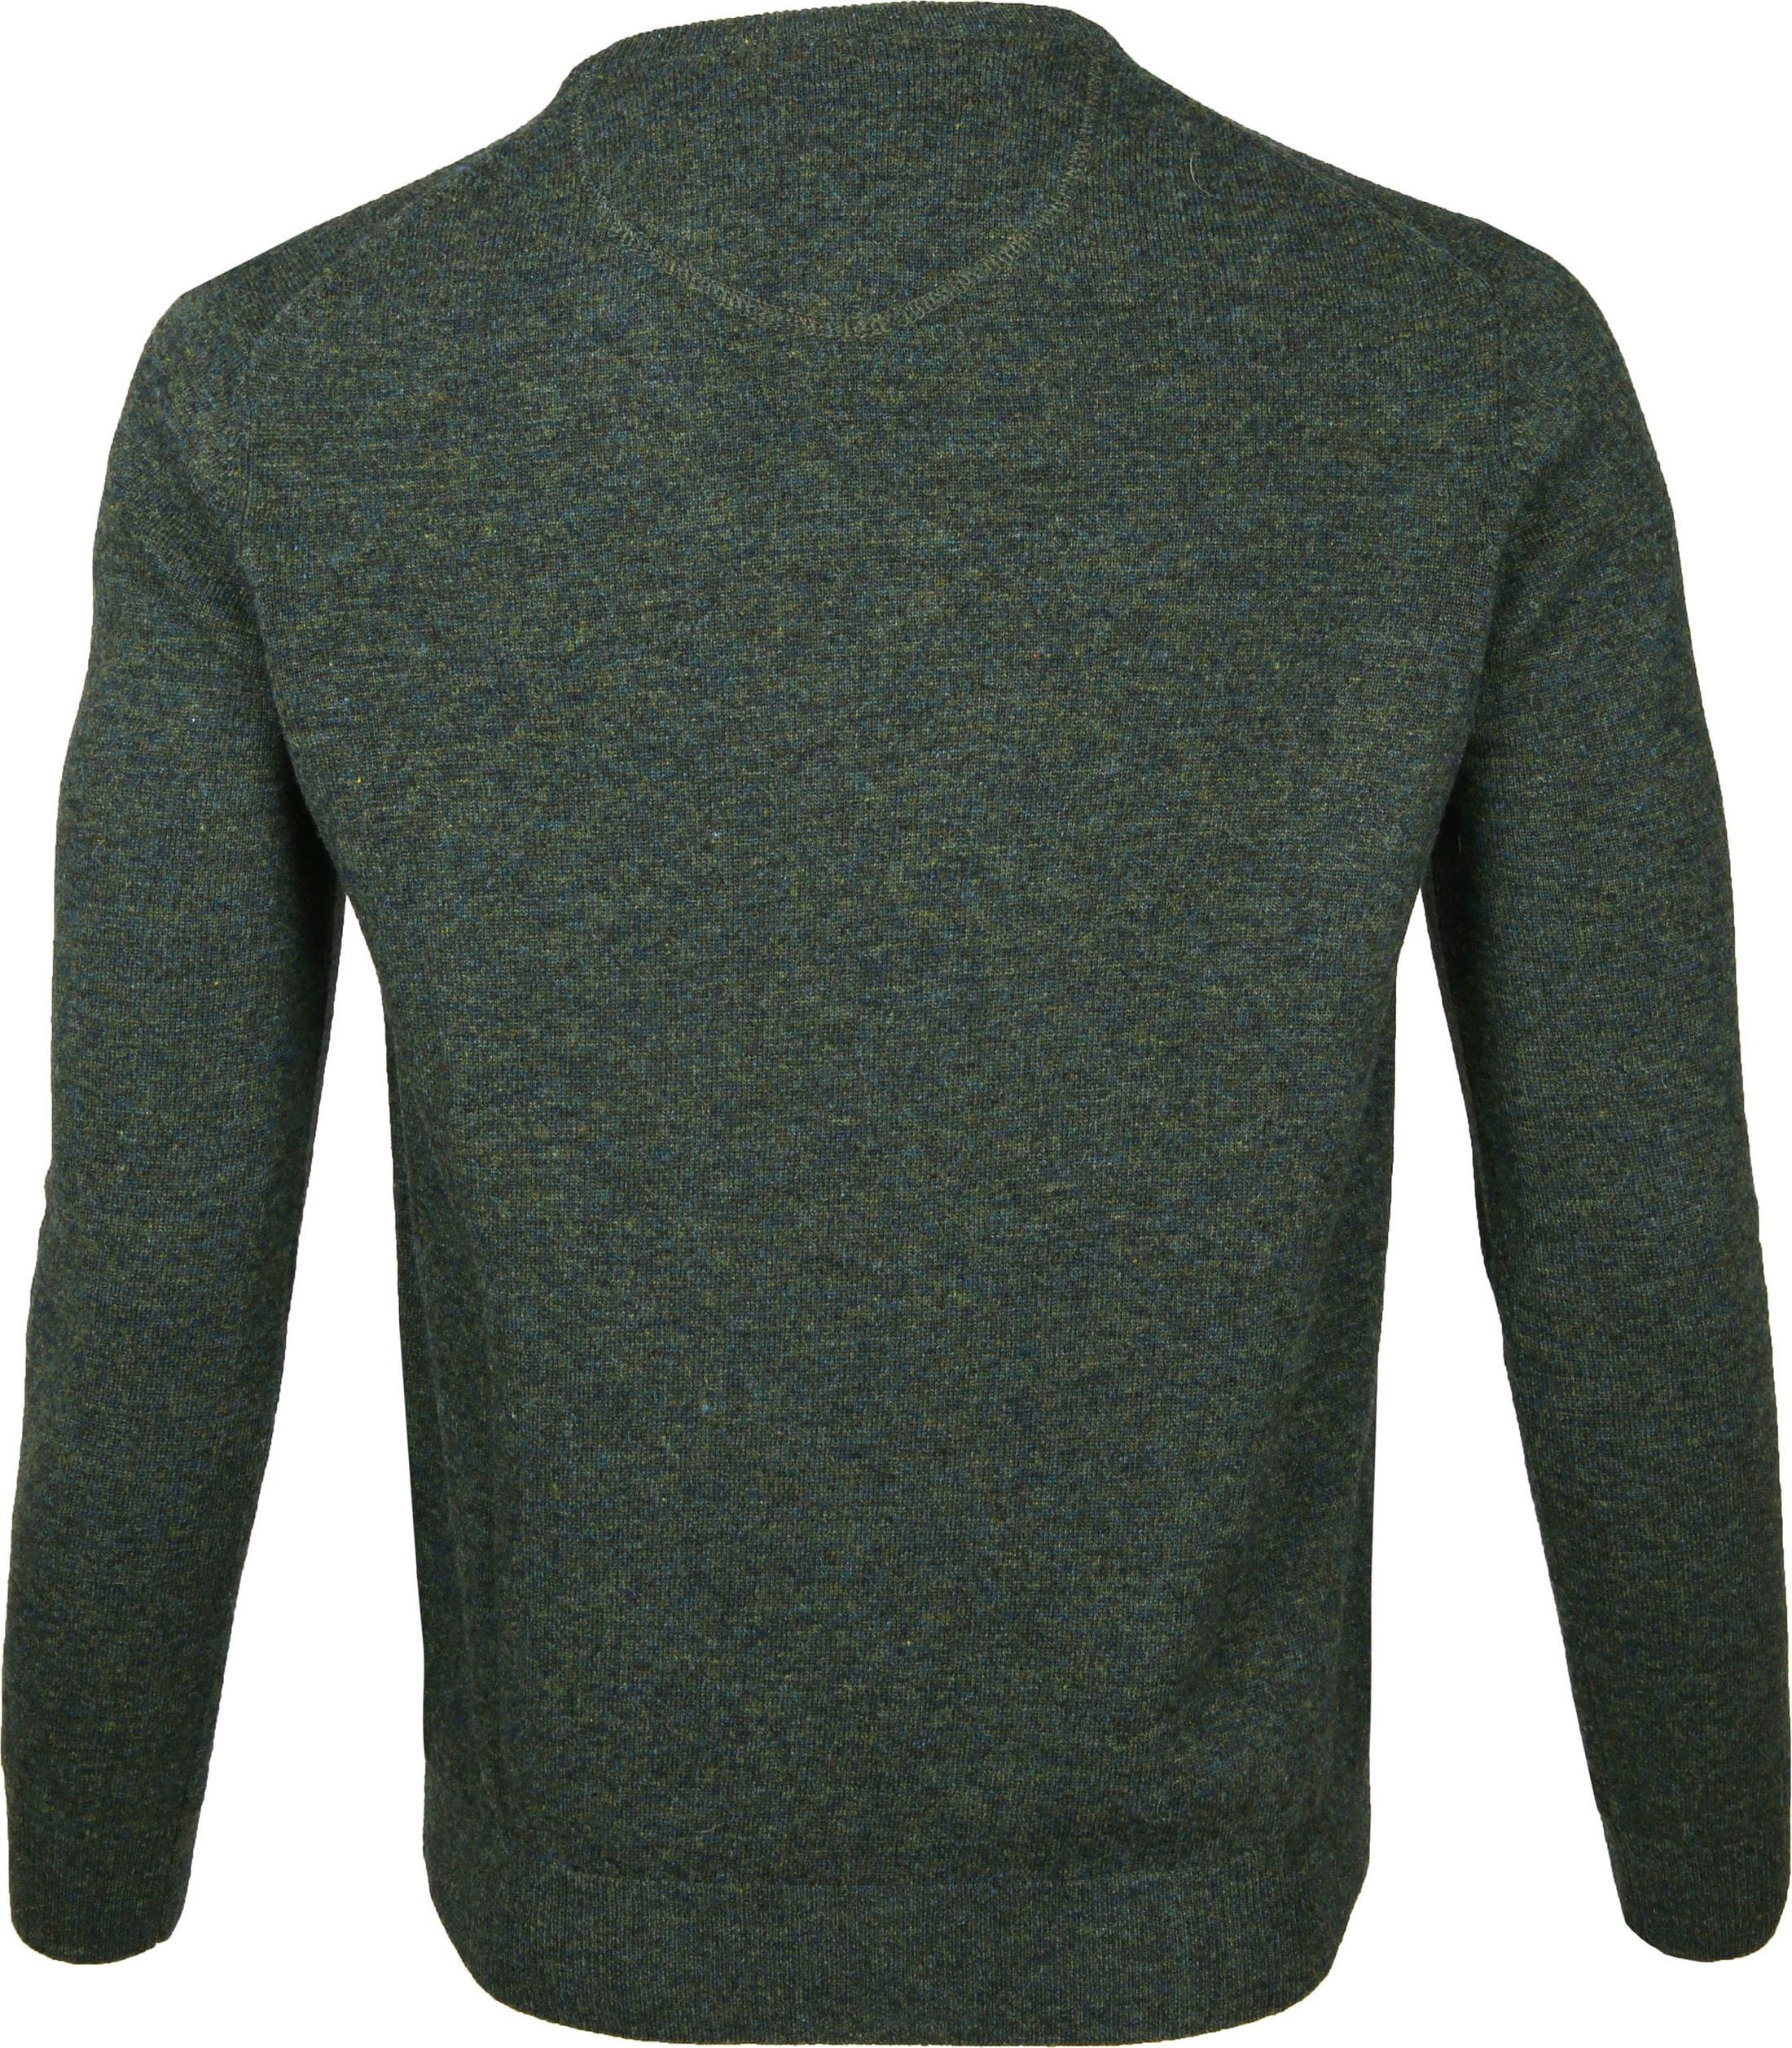 Suitable Pullover Lamswol V-Hals Donkergroen foto 2